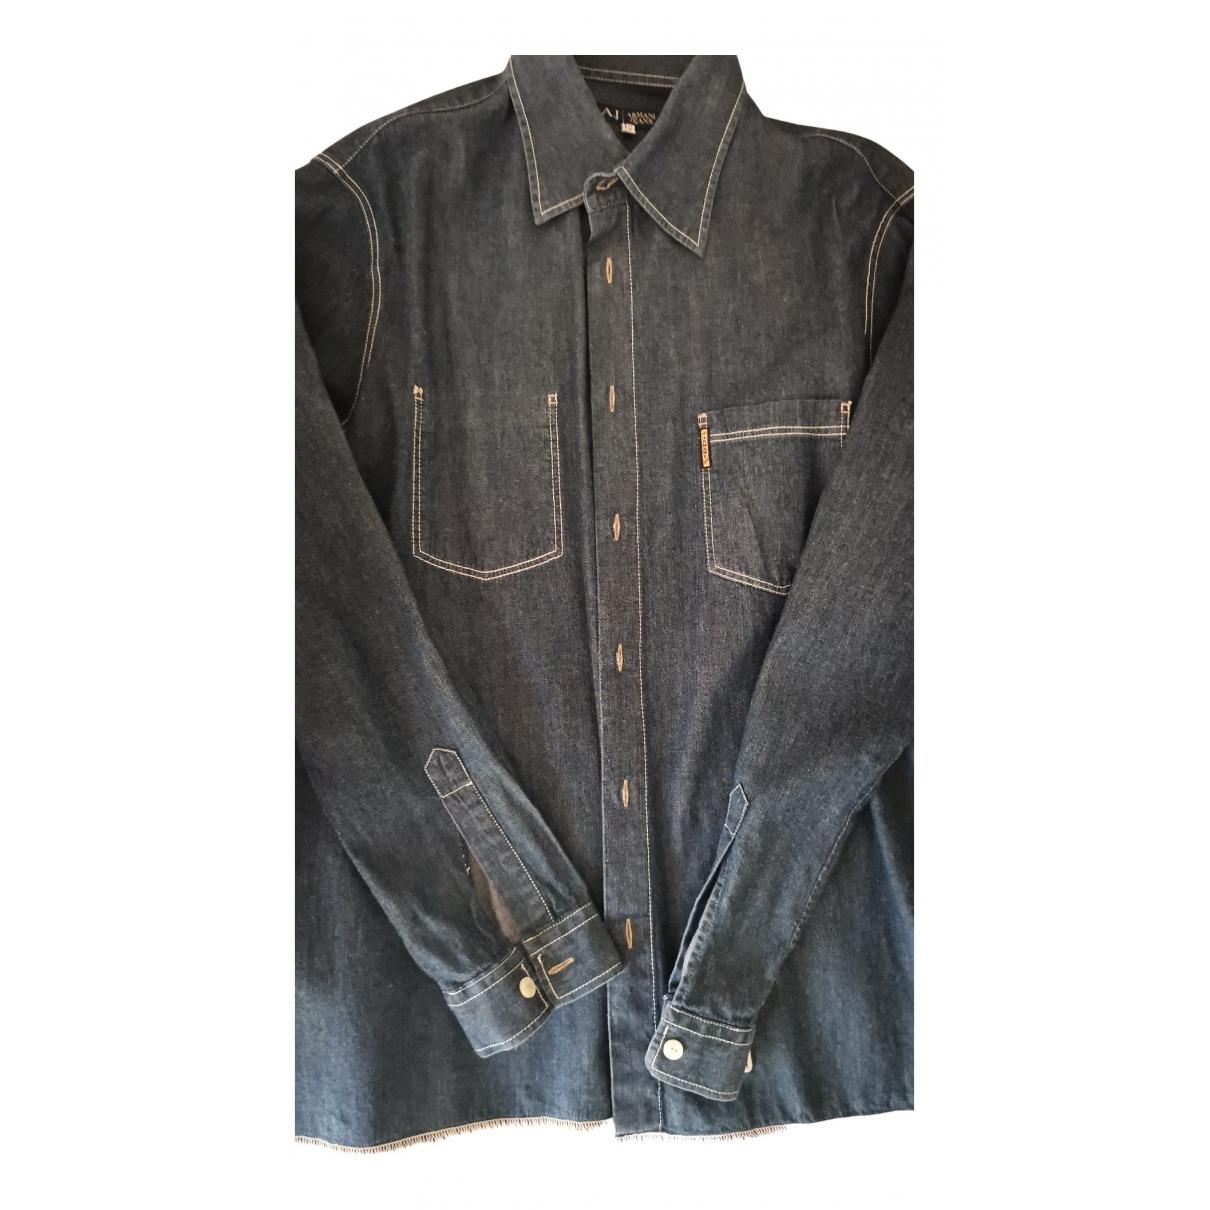 Armani Jeans N Blue Denim - Jeans Shirts for Men 3XL International